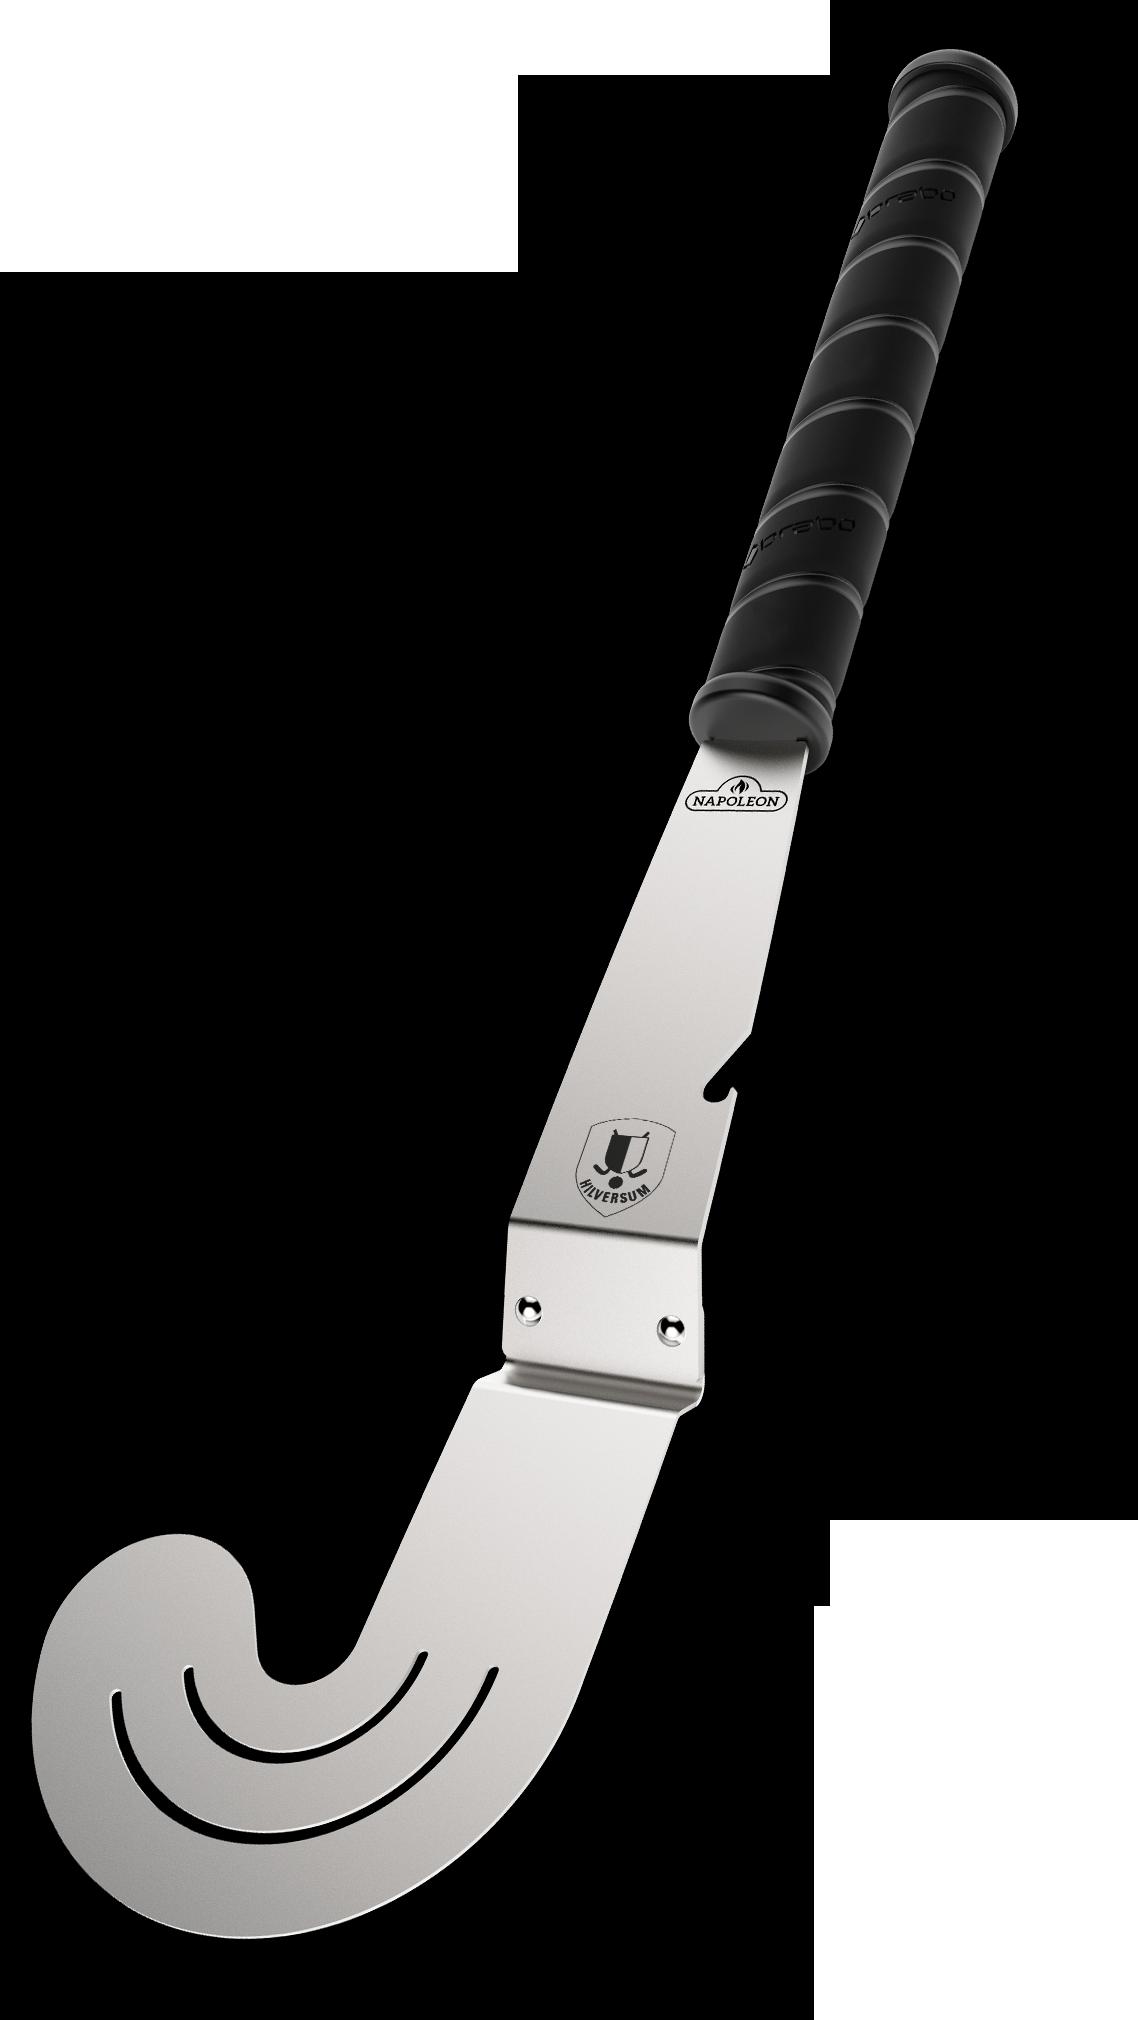 HMHC Hockey BBQ Stick